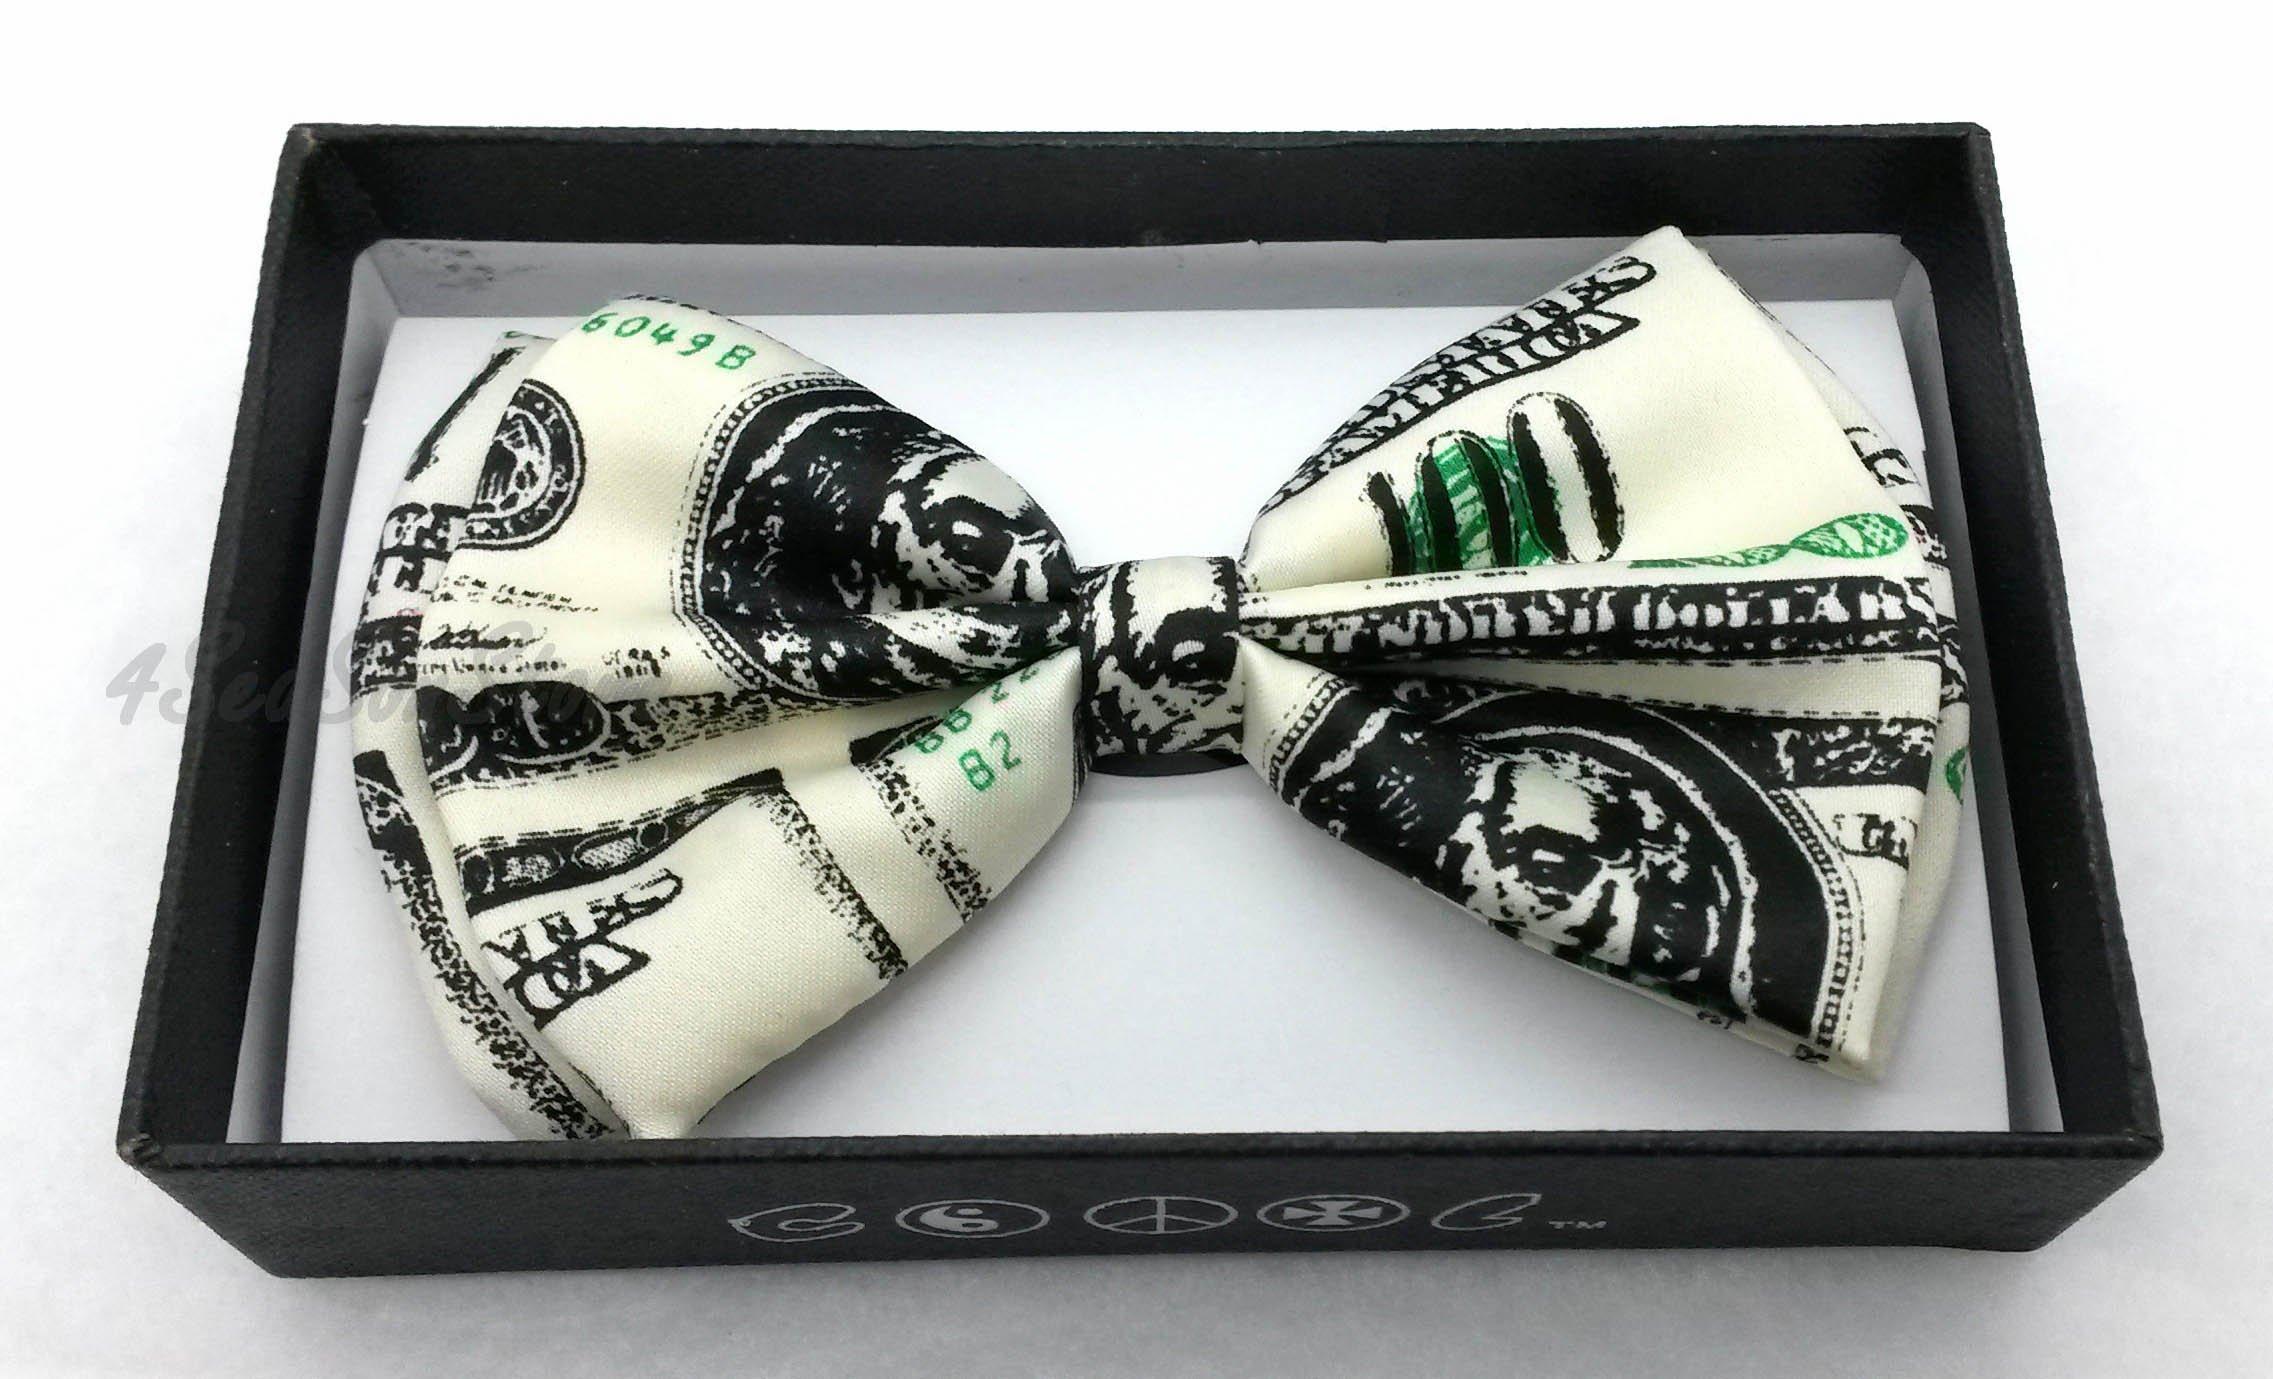 Color Tuxedo Classic Bow Tie, Cravat, Necktie, Neckwear Adjustable Men's Fashion Bowtie - Money